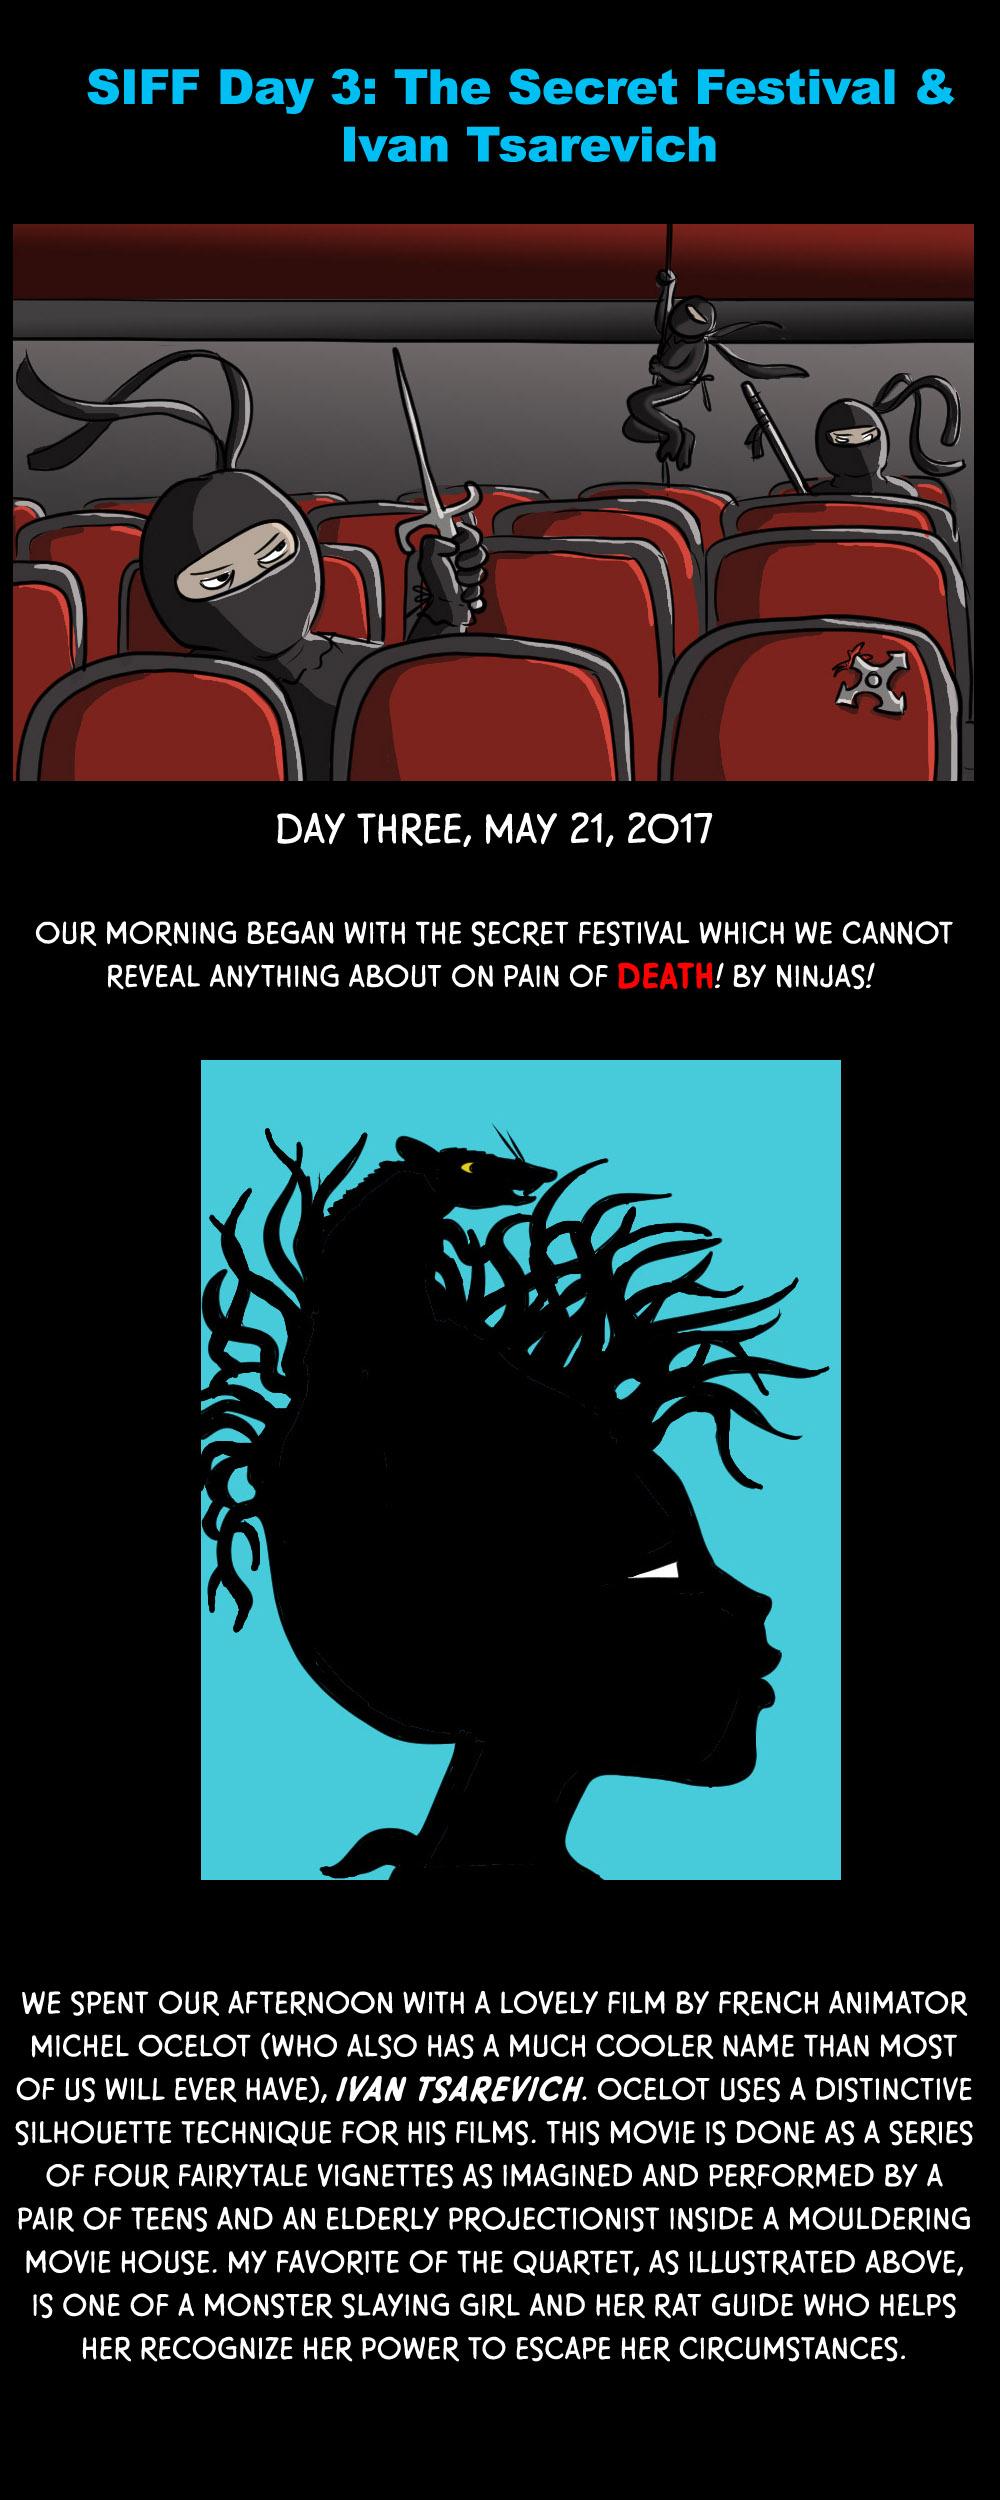 SIFF Day 3: The Secret Festival and Ivan Tsarevich